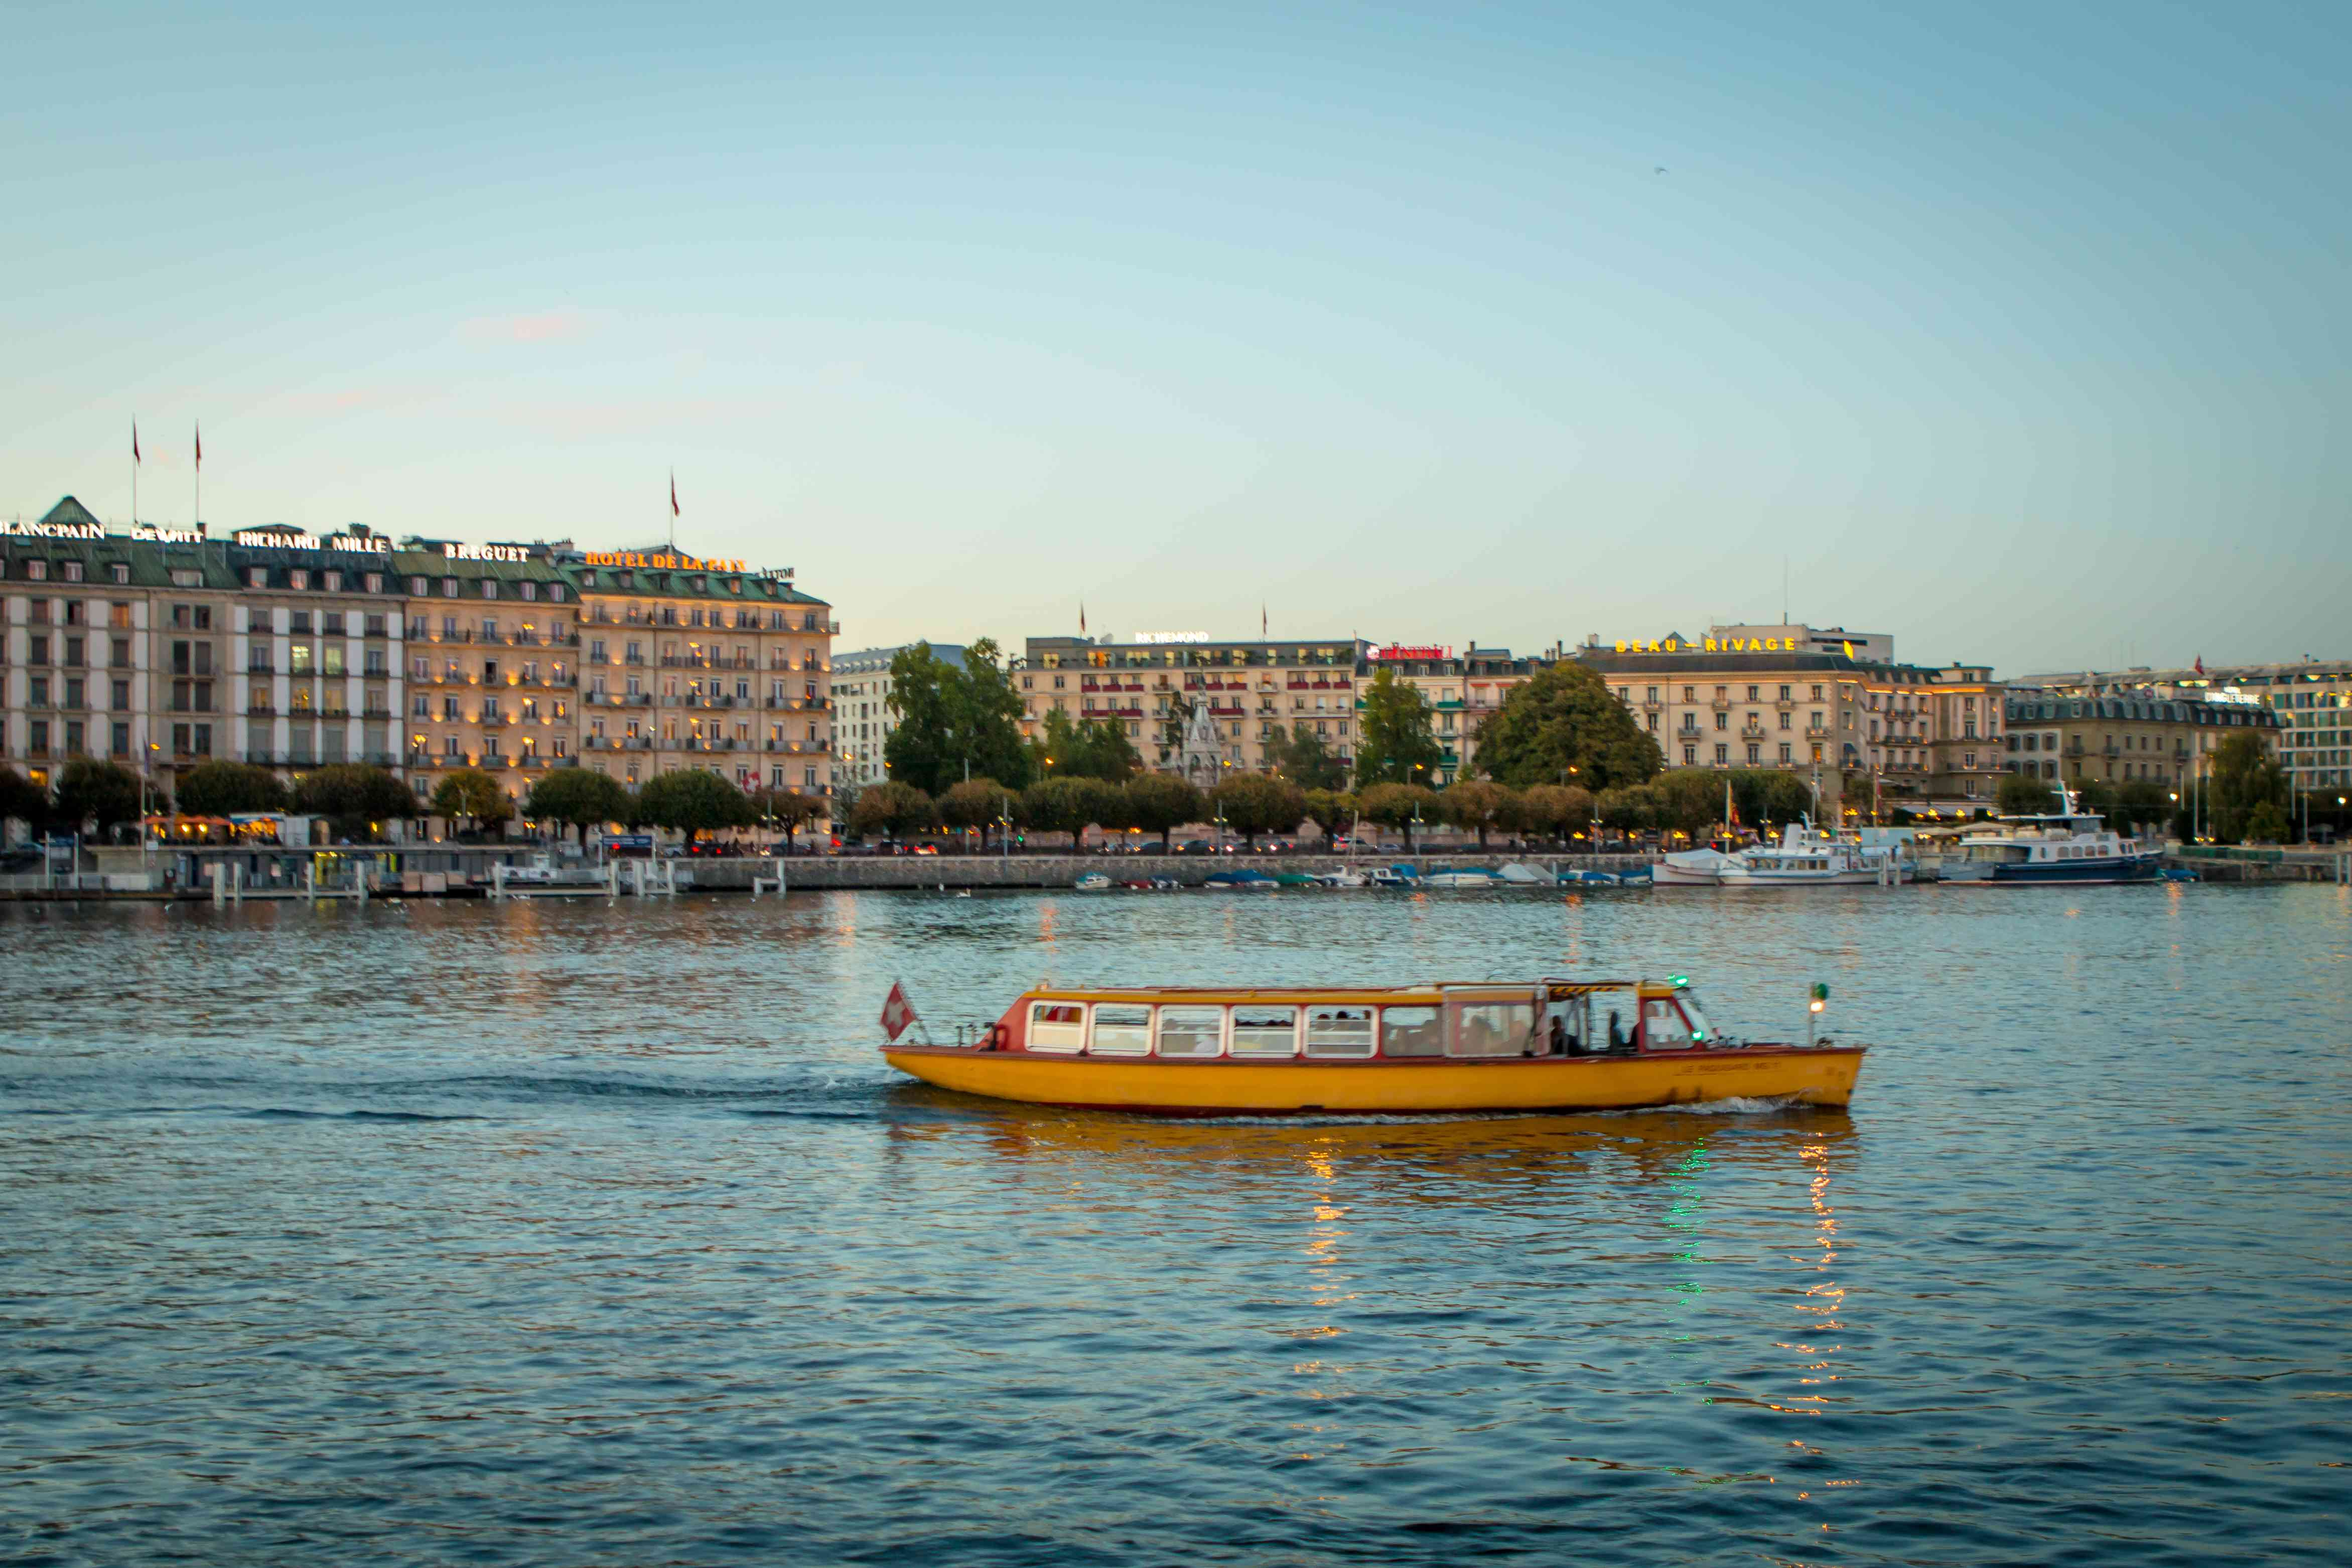 Geneva Switzerland lakeside with Mouette (Yellow boat)